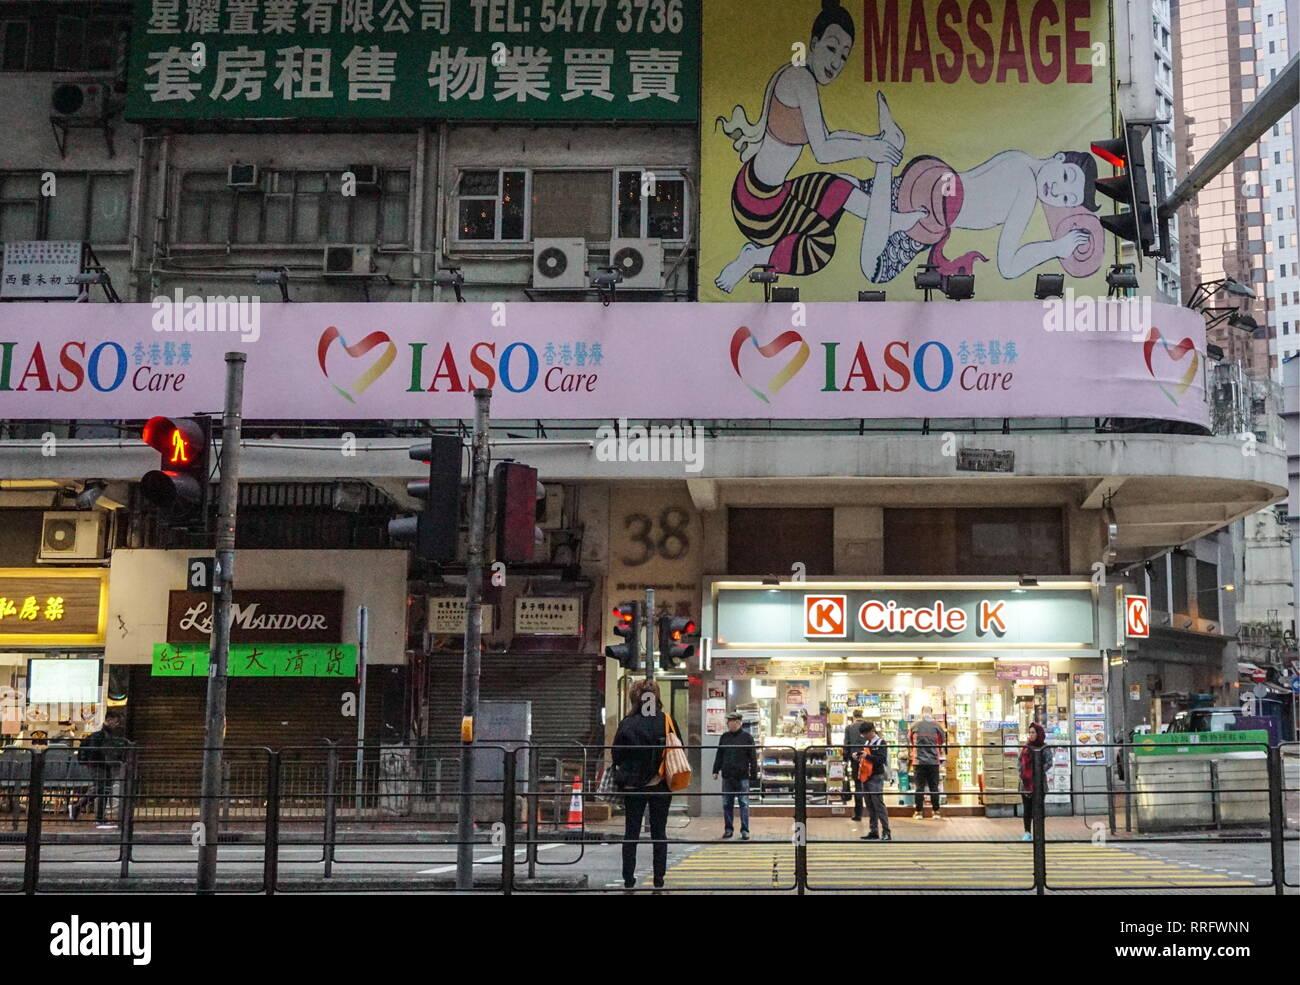 HONG KONG, CHINA - FEBRUARY 26, 2019: Hennessy Road, Wan Chai, Hong Kong Special Administrative Region (HKSAR) of the People's Republic of China. Alexander Shcherbak/TASS - Stock Image